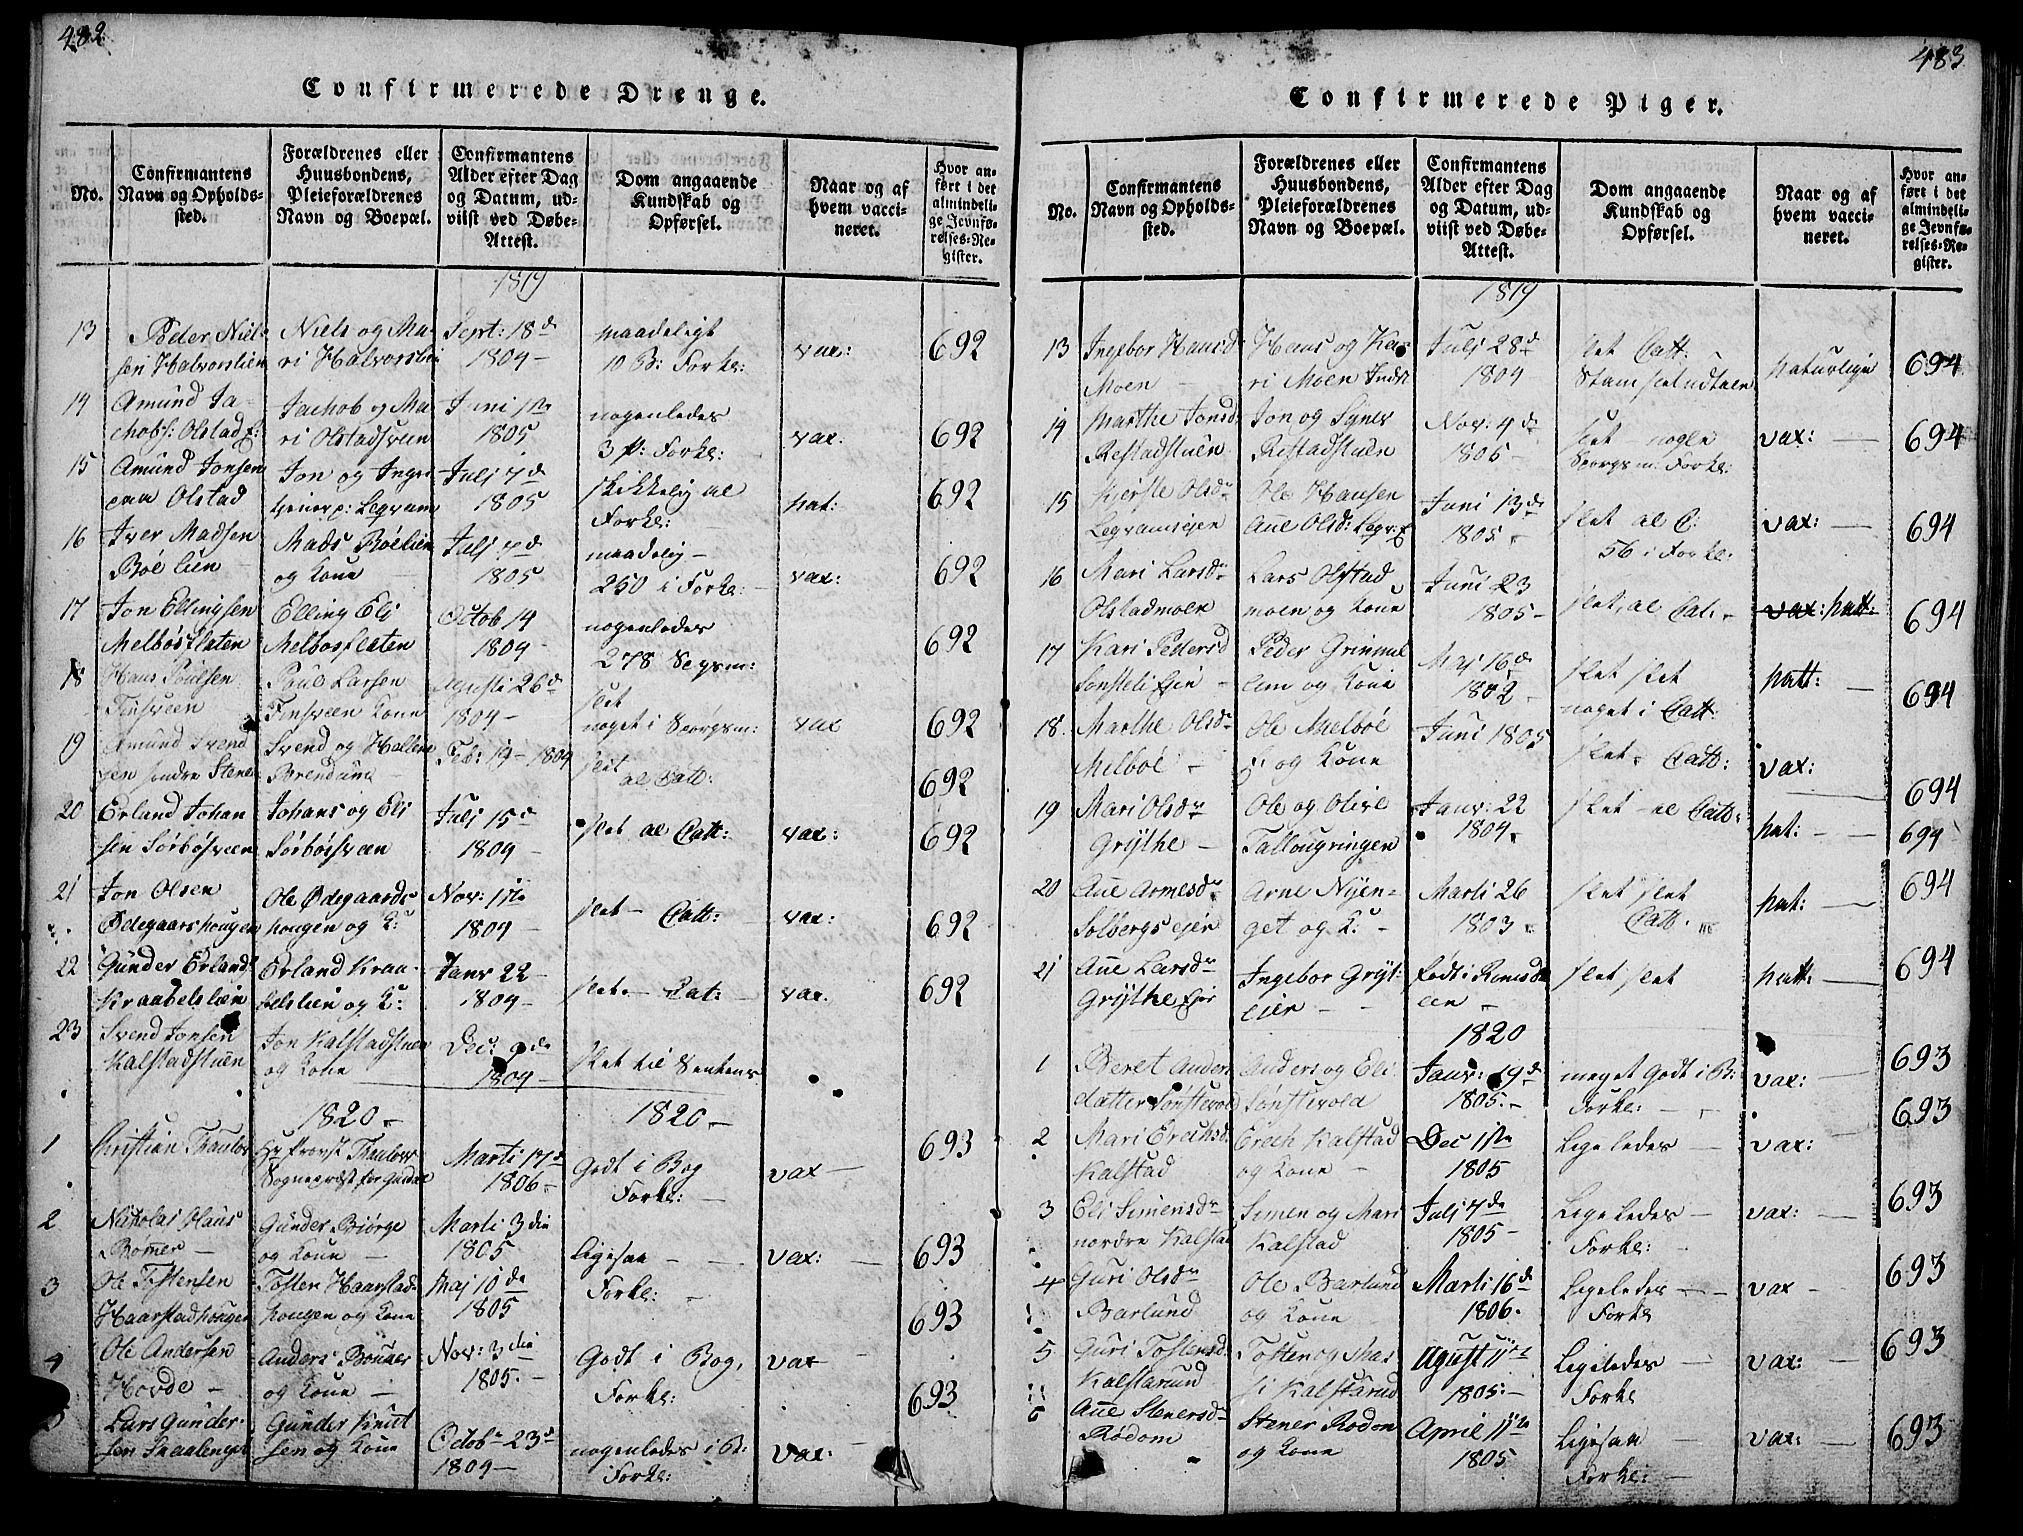 SAH, Gausdal prestekontor, Ministerialbok nr. 5, 1817-1829, s. 482-483